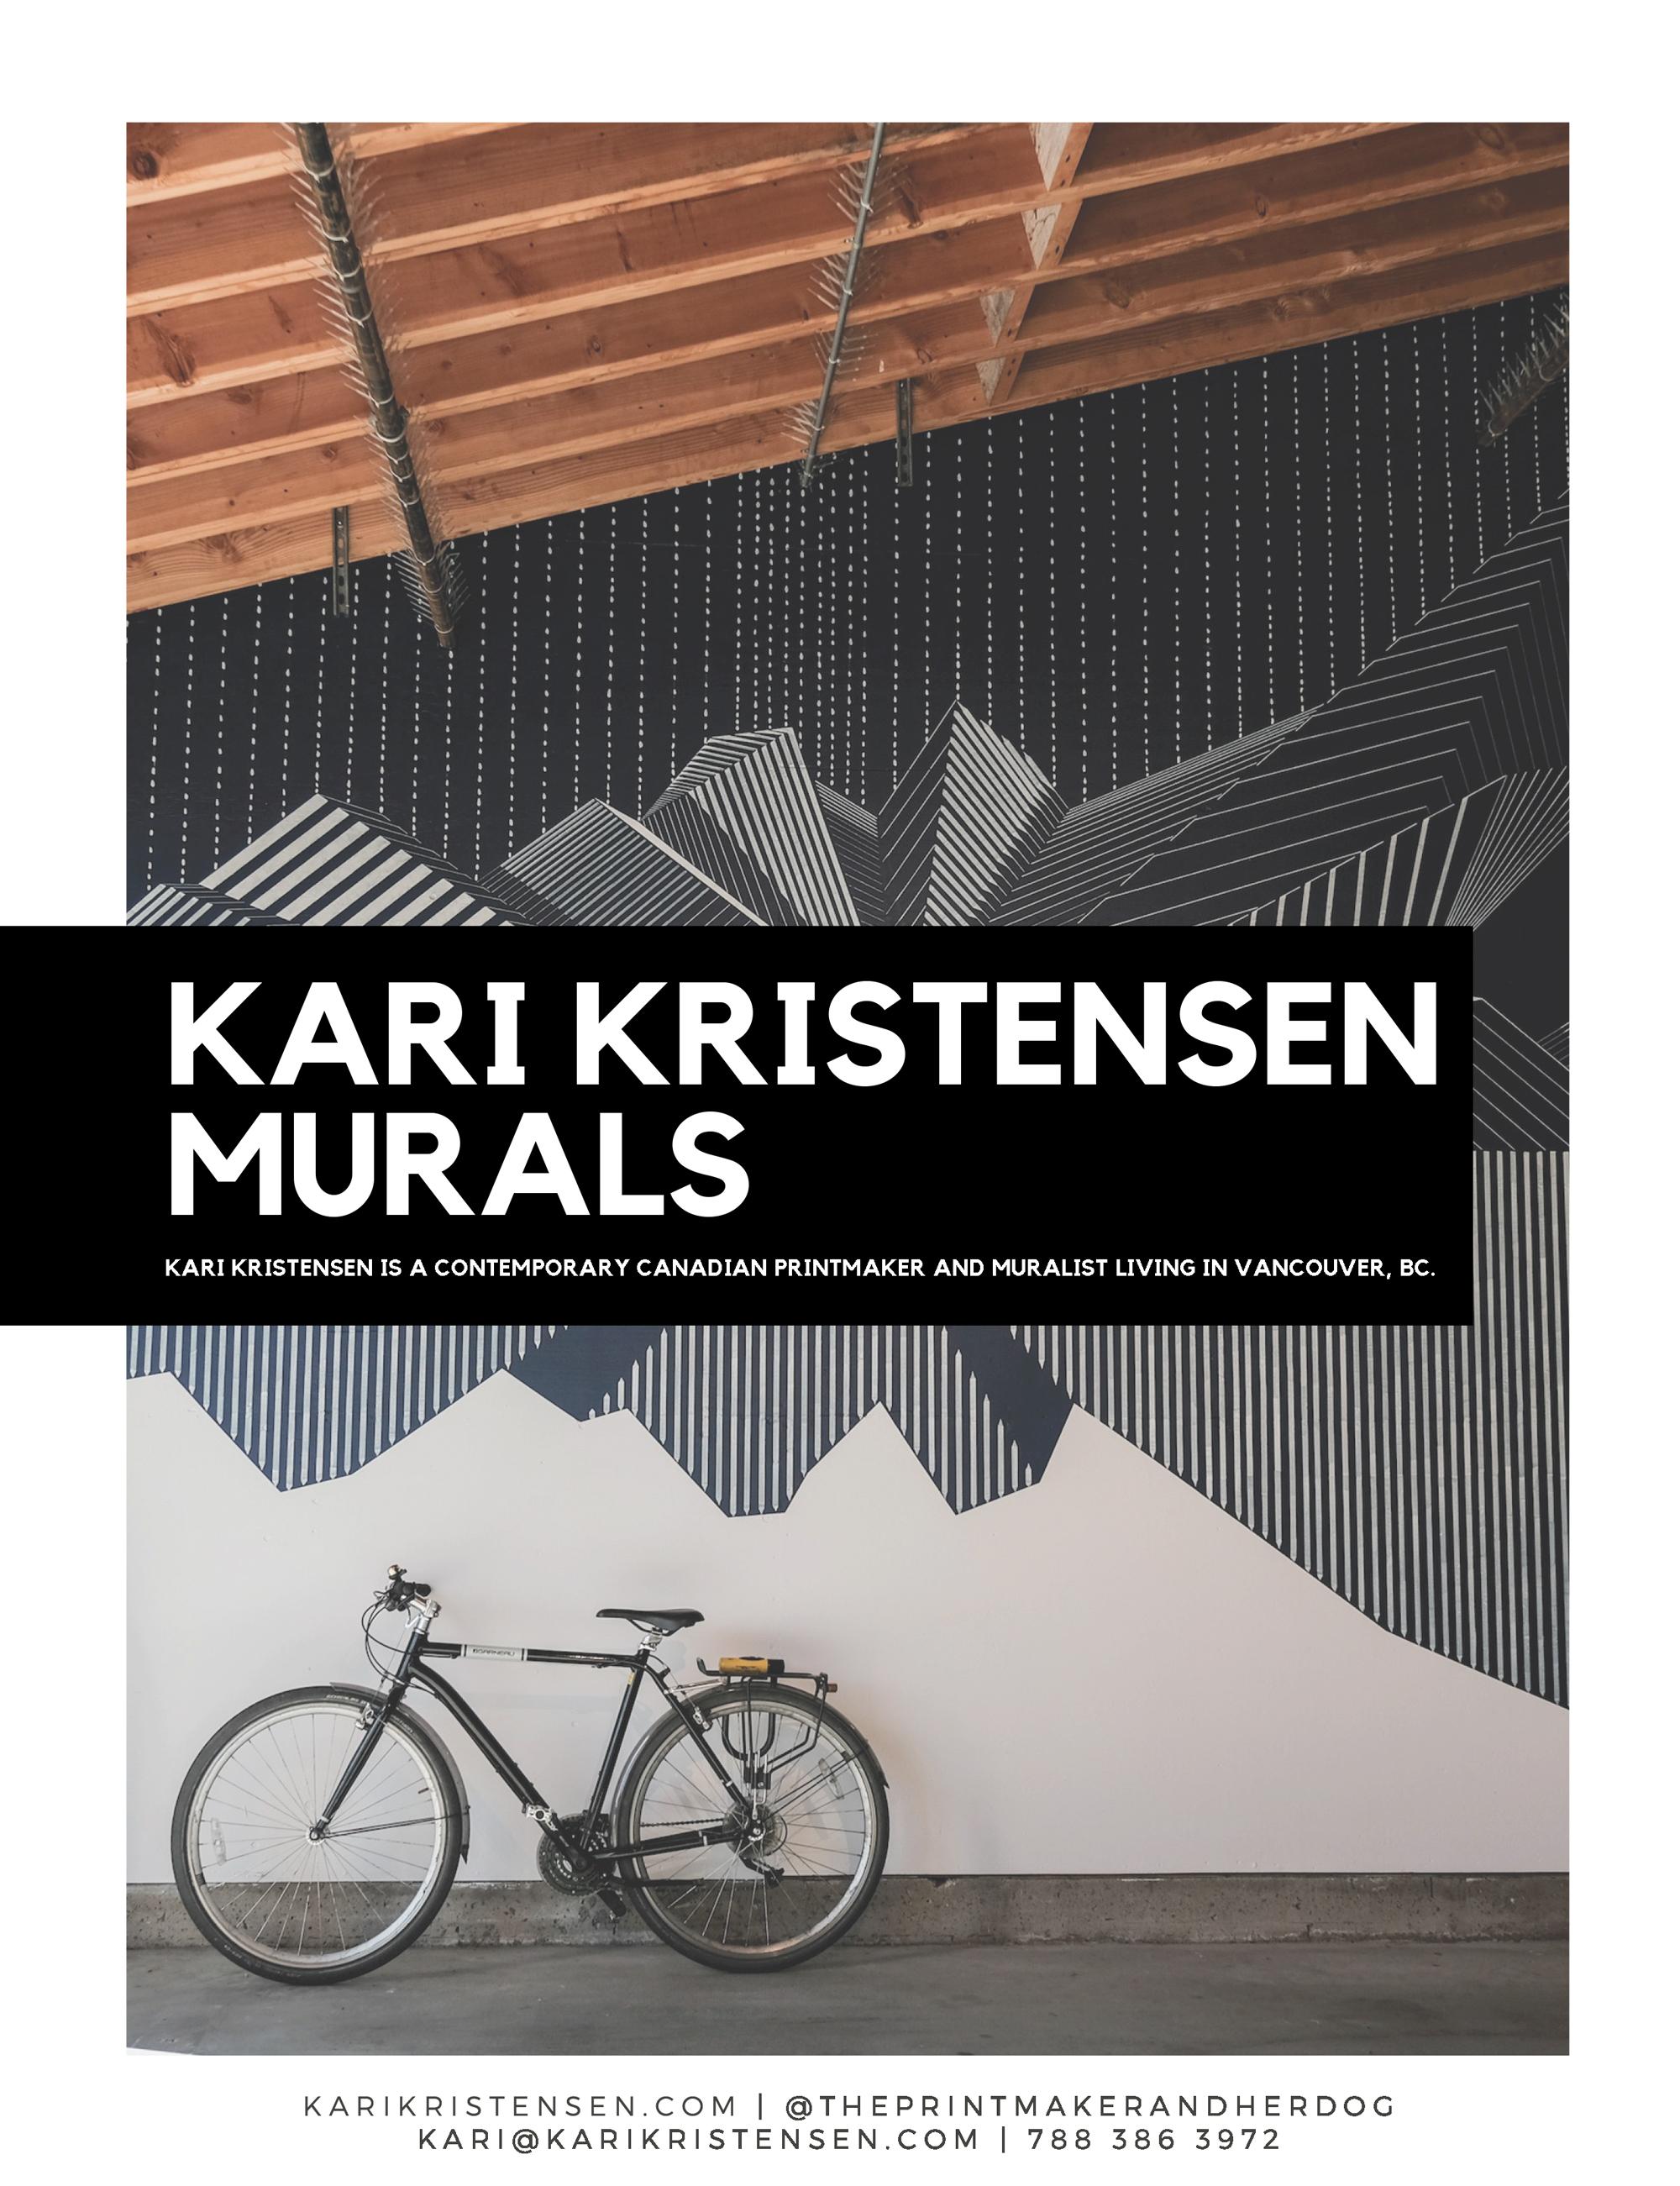 Kari Kristensen Murals.jpg